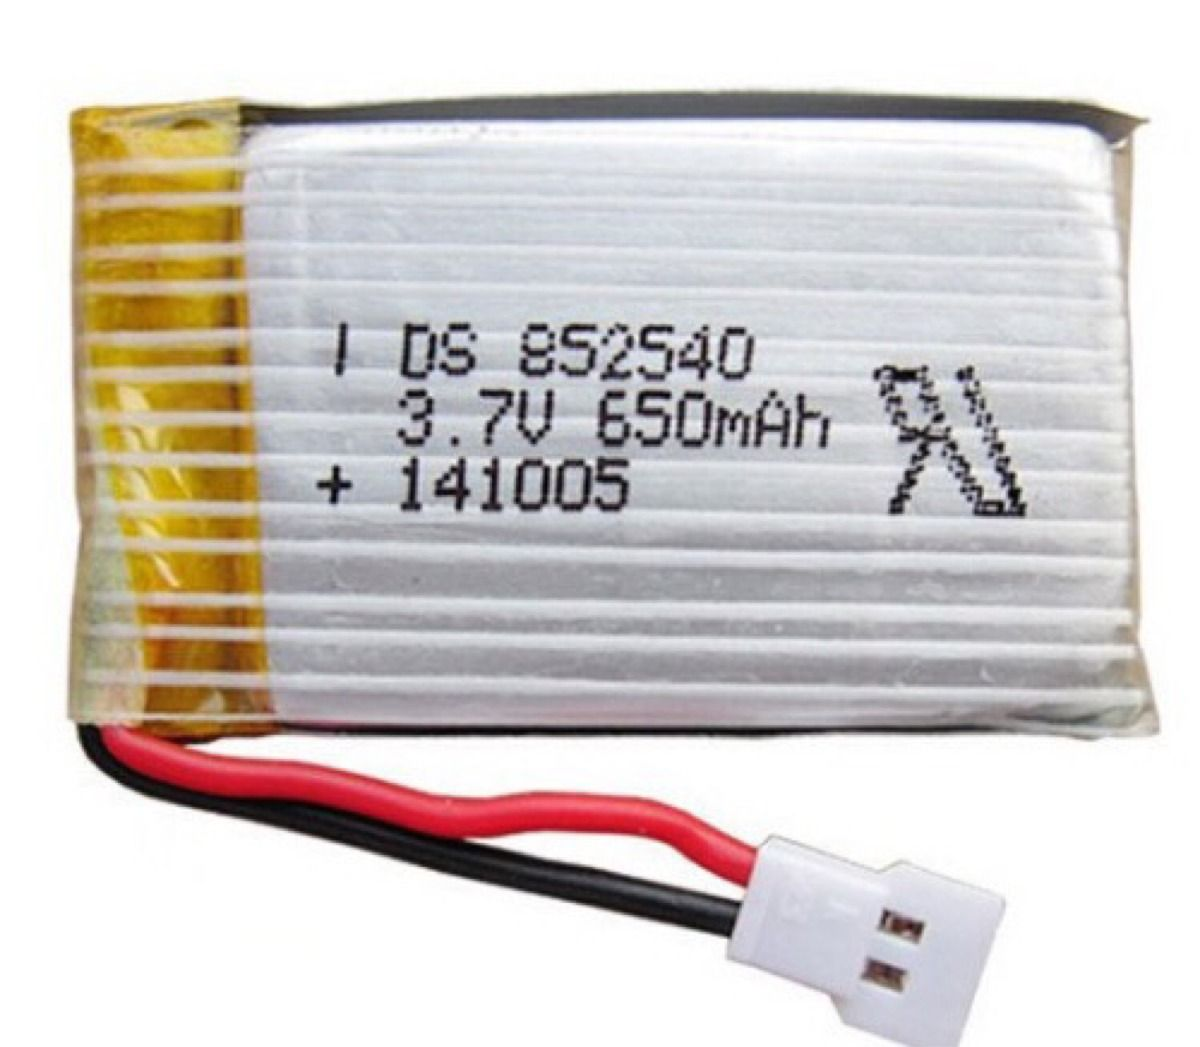 FUL650115 - Bateria Fullymax Hubsan / Syma 650mAh 1S 3.7v 15C